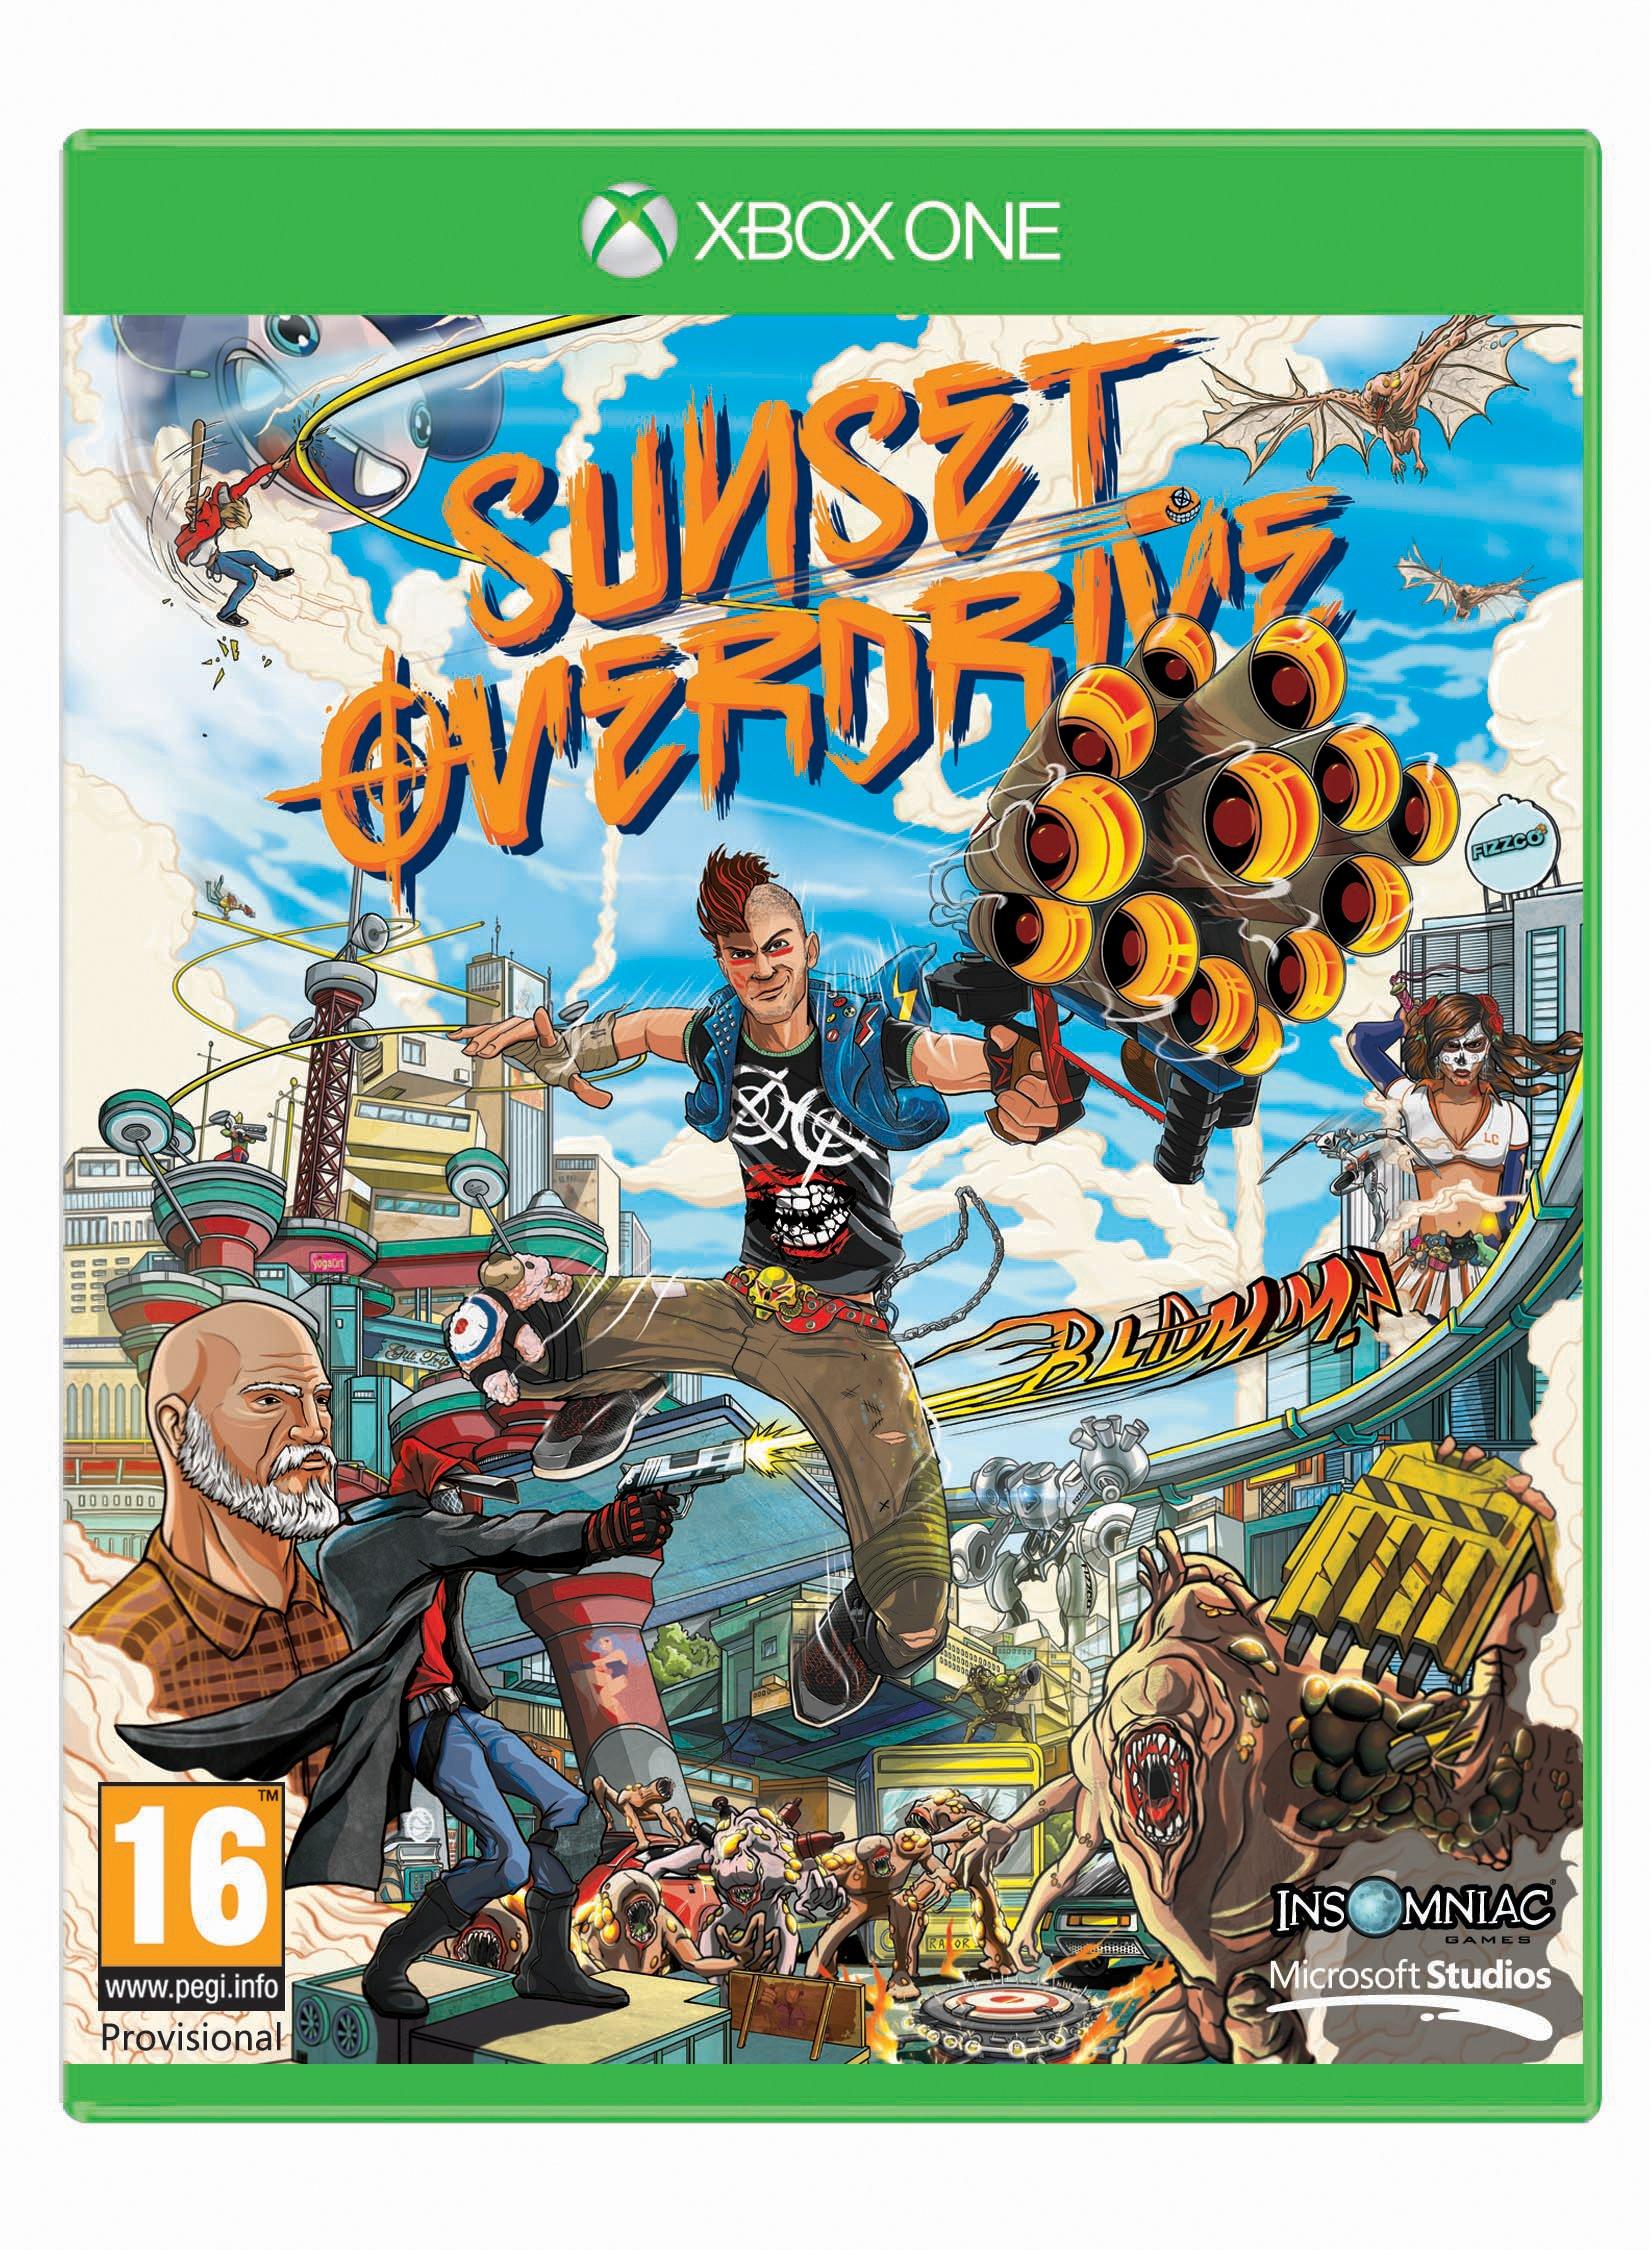 Sunset Overdrive (Xbox One) product image